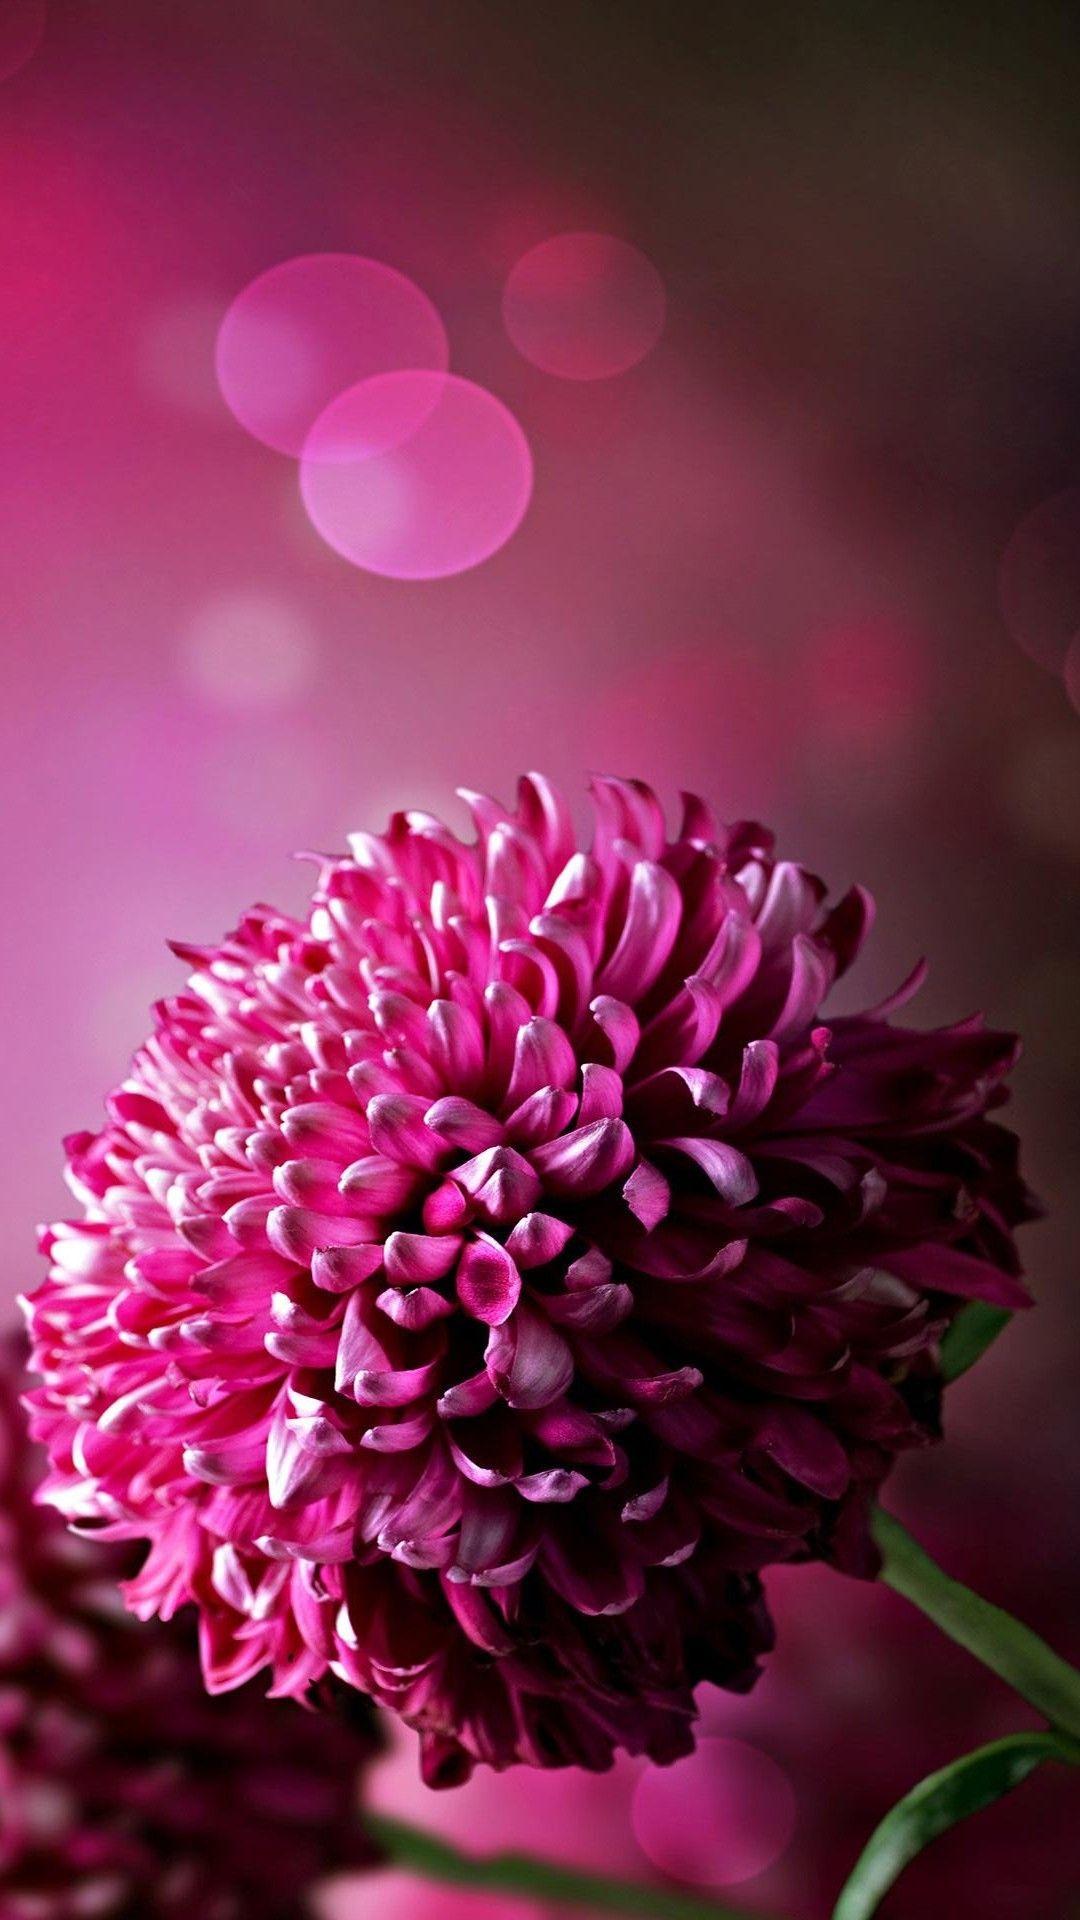 Purple Flowers Wallpaper For Phone | Purple flowers ...